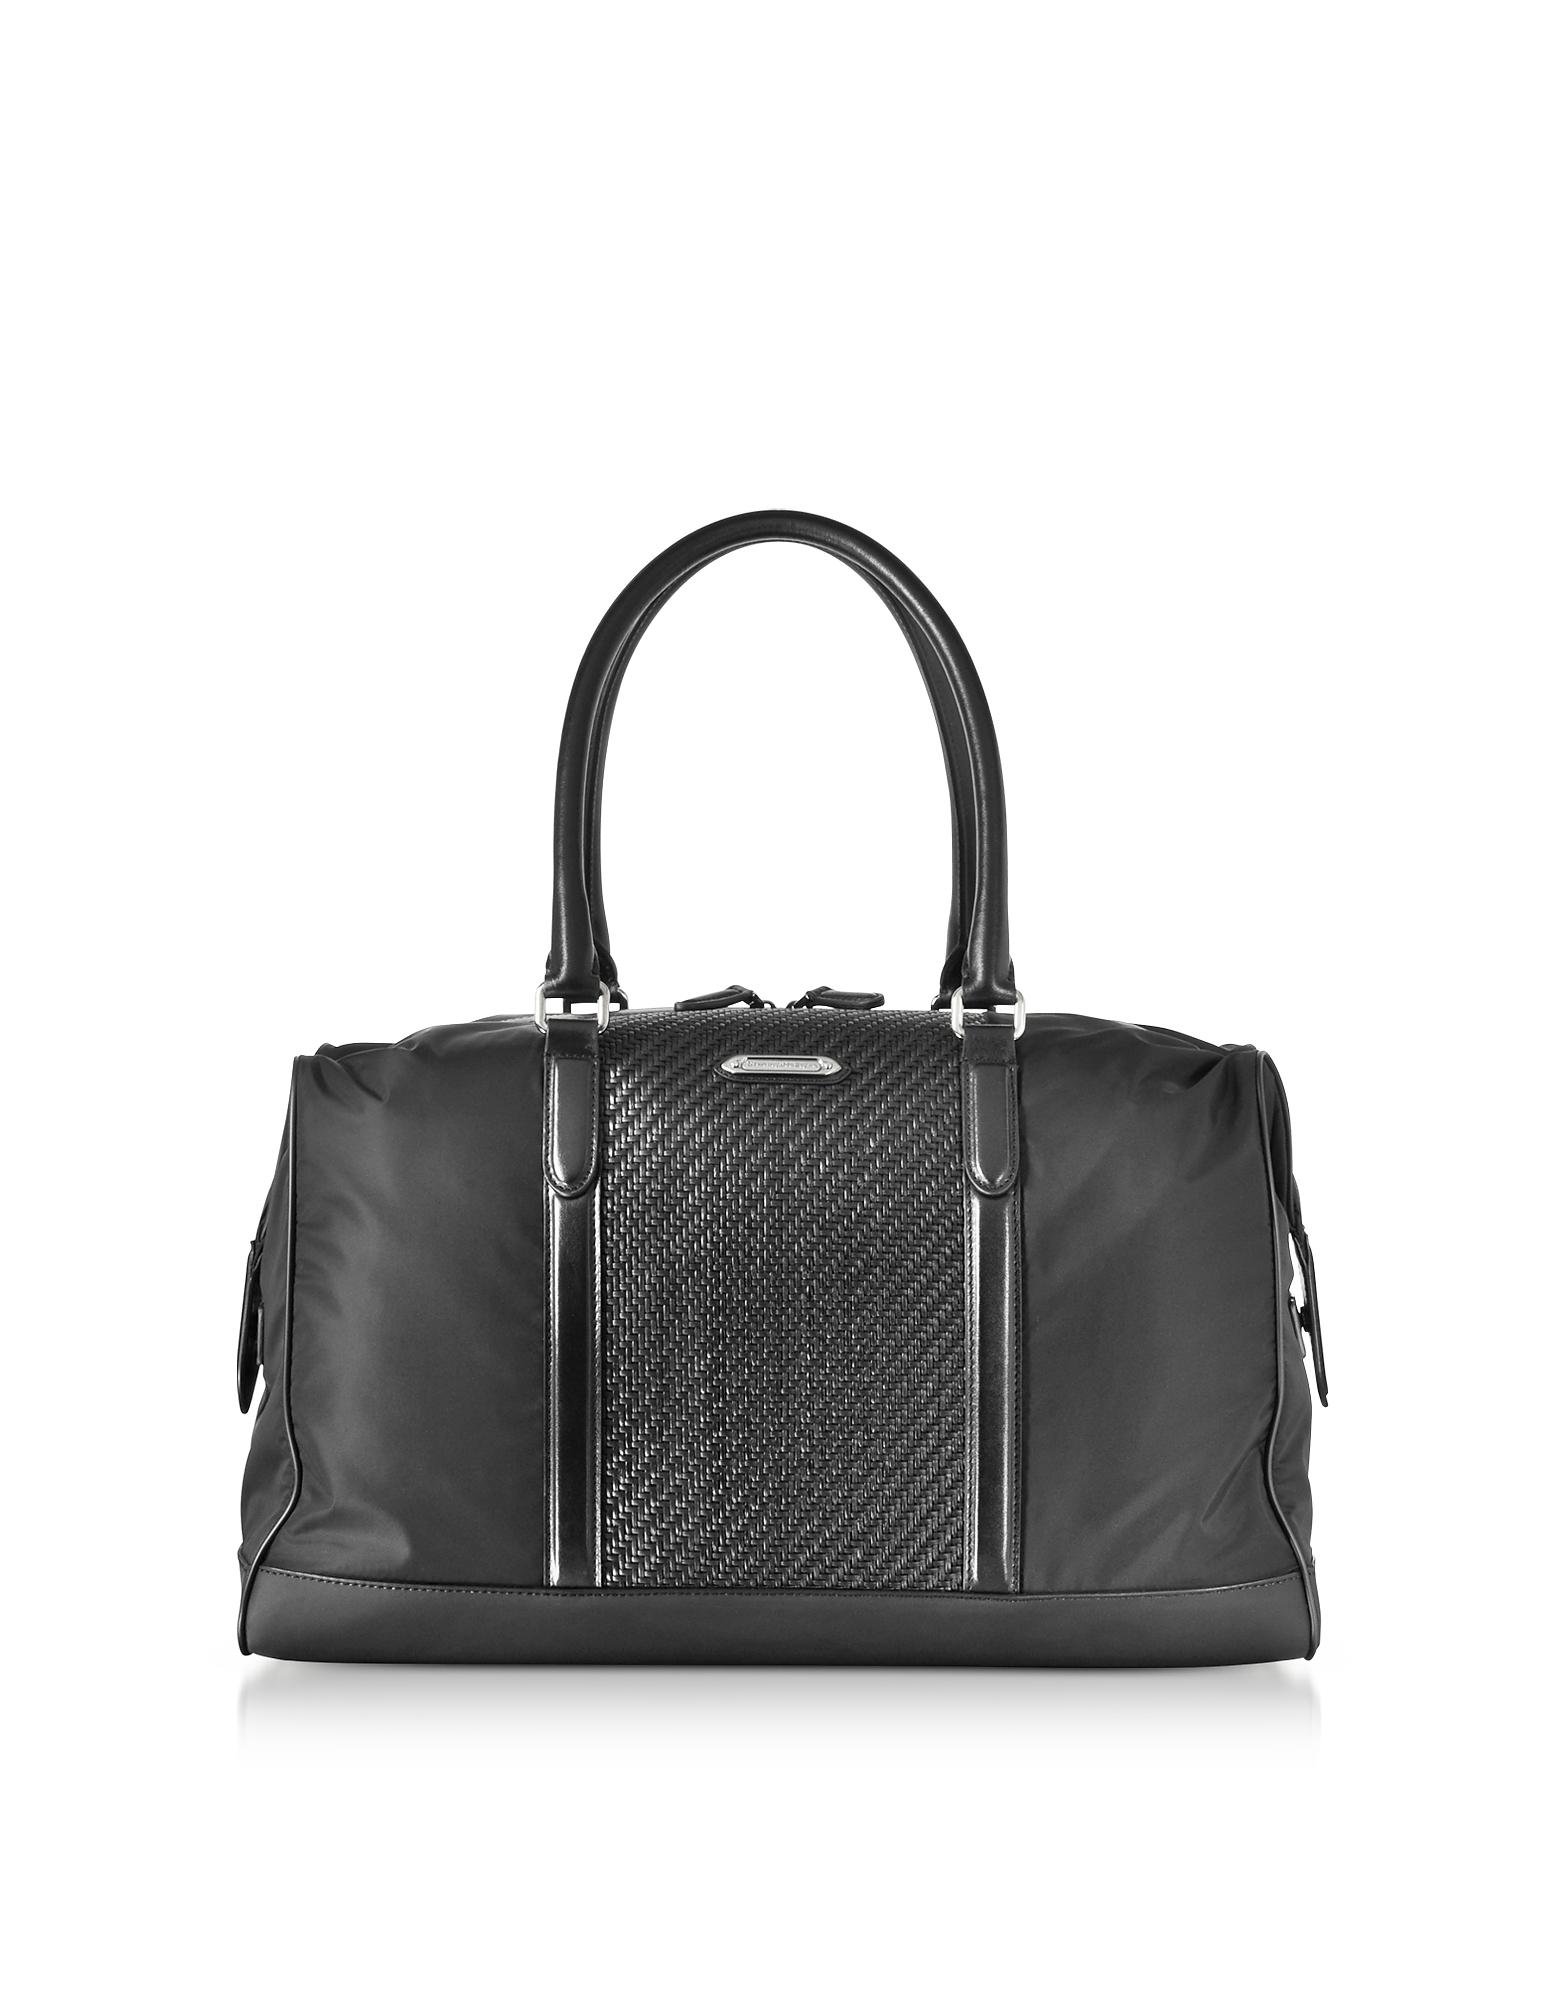 Ermenegildo Zegna Travel Bags, Black Nylon and Woven Leather Holdall